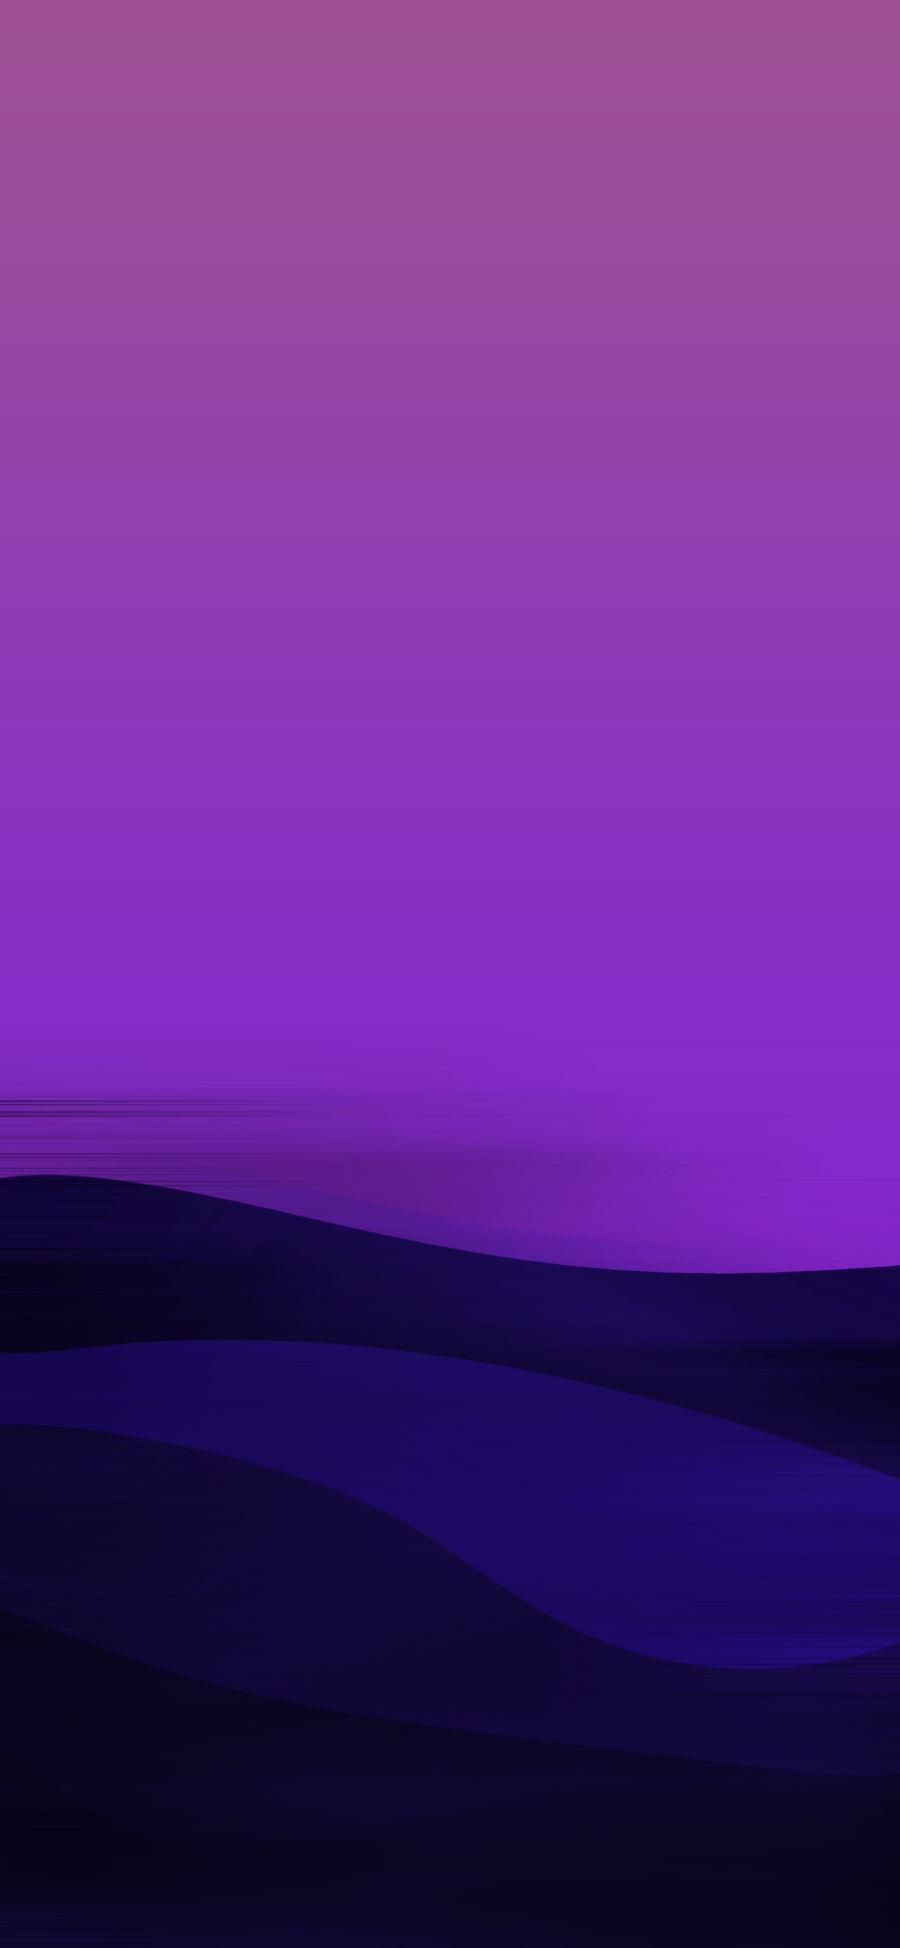 Iphone Xs Max Wallpaper Sunseblu By Janosch500 On Deviantart